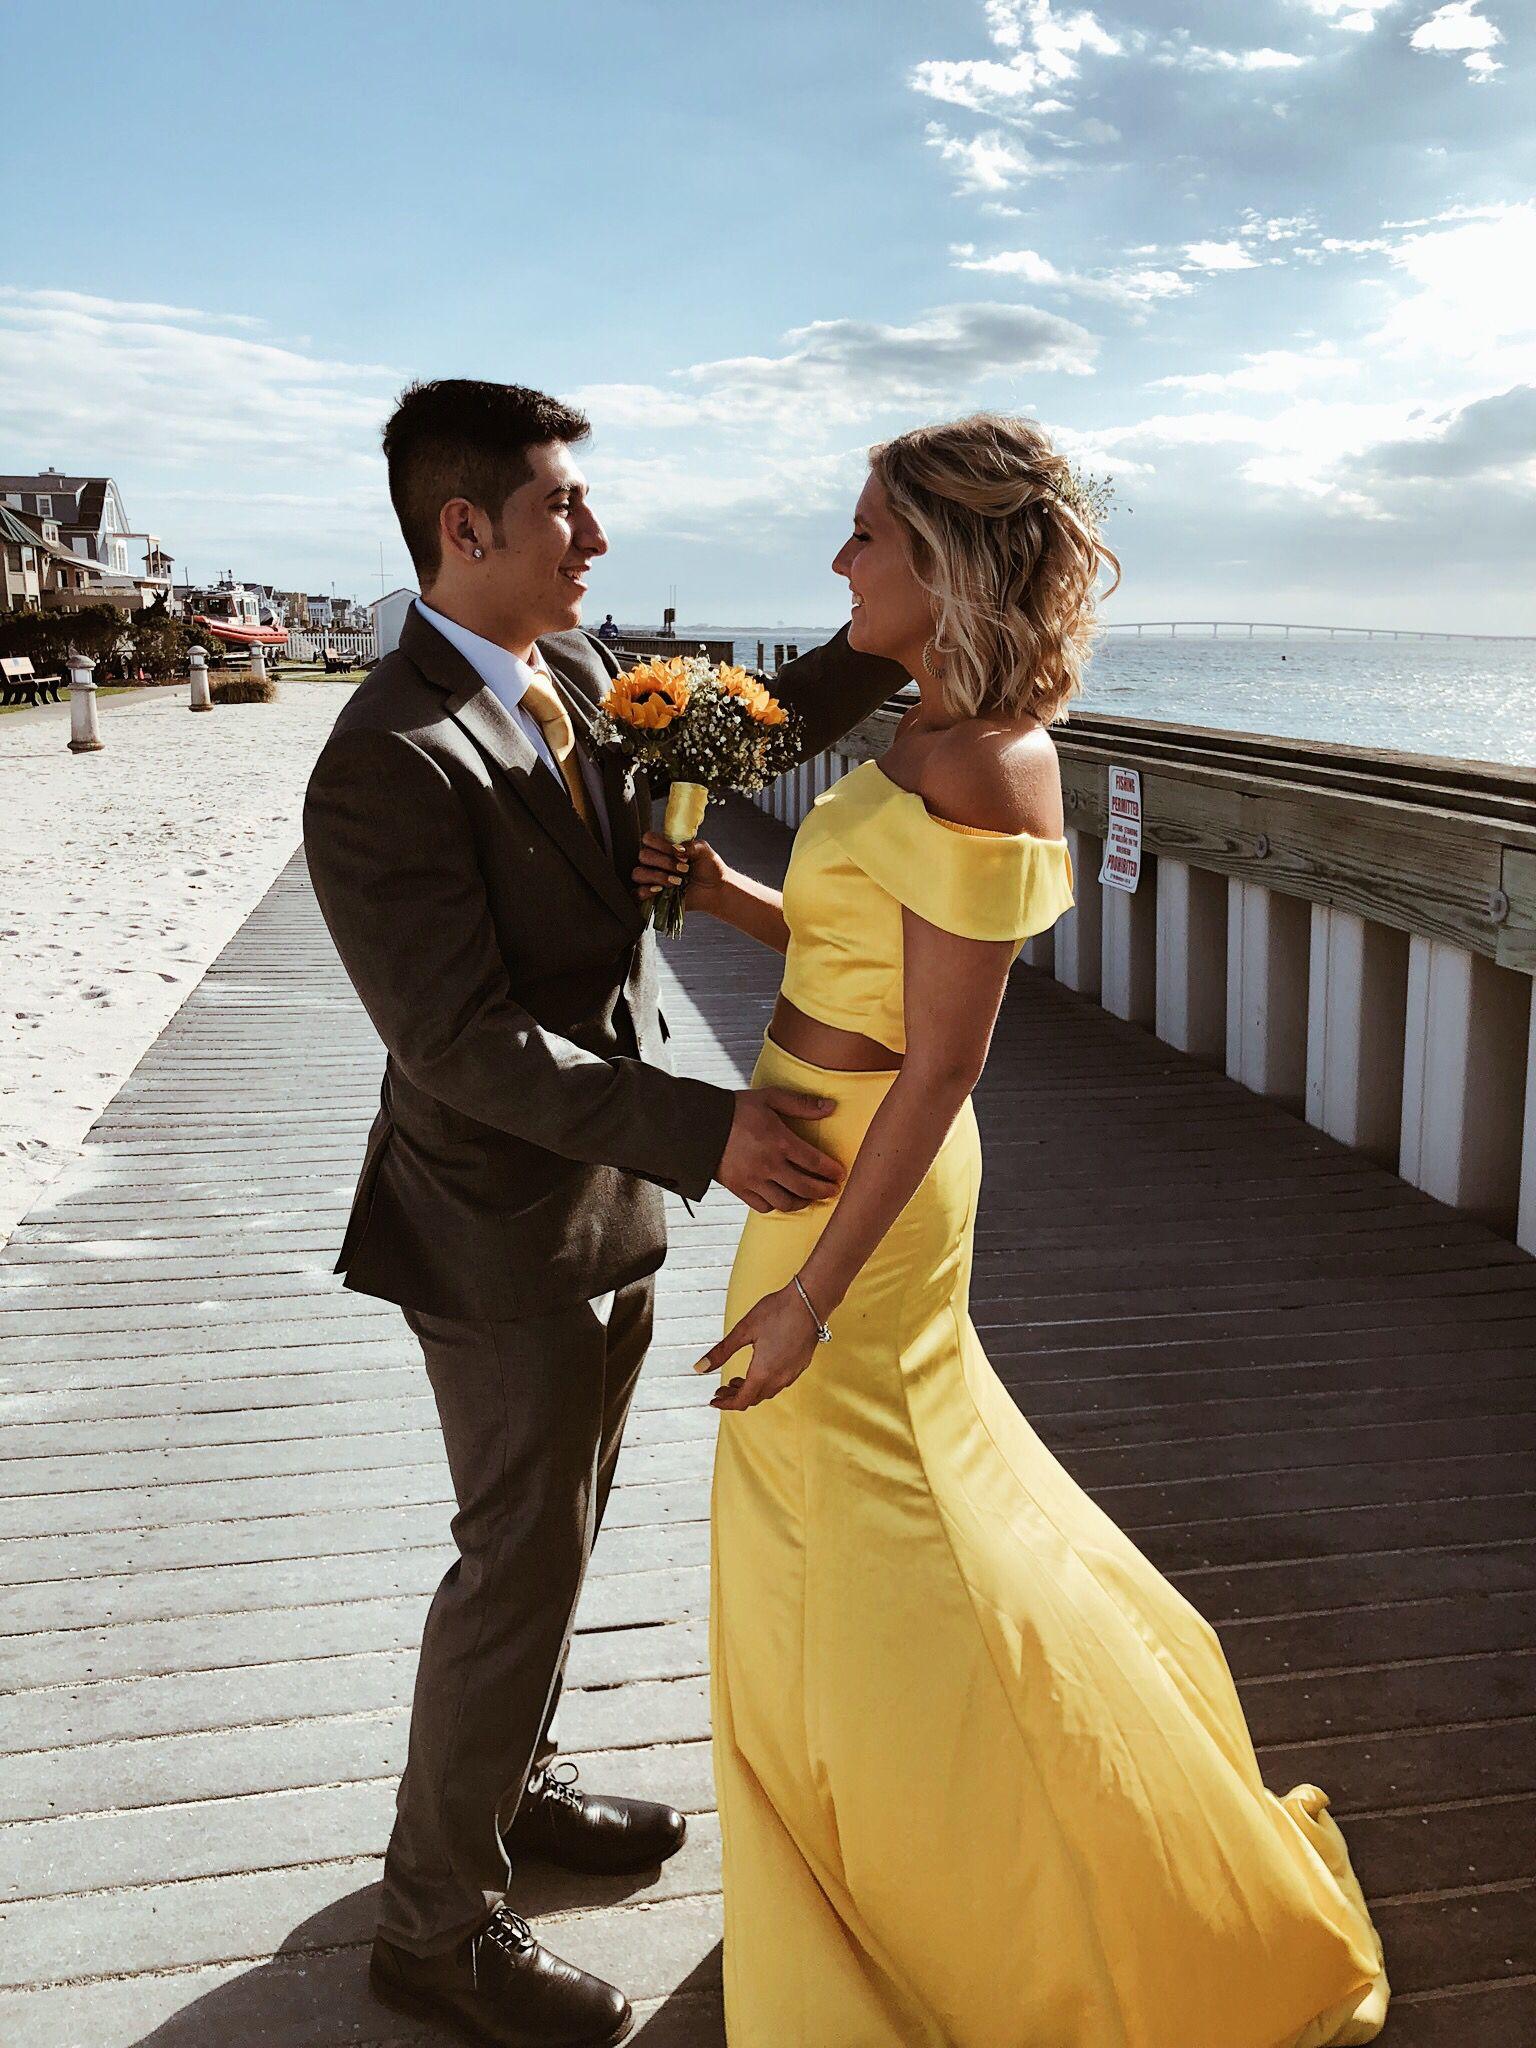 Pinterest Emilydinoto Instagram Emilydinoto Vsco Emilydinoto Prom Dresses Yellow Piece Prom Dress Pretty Prom Dresses [ 2048 x 1536 Pixel ]